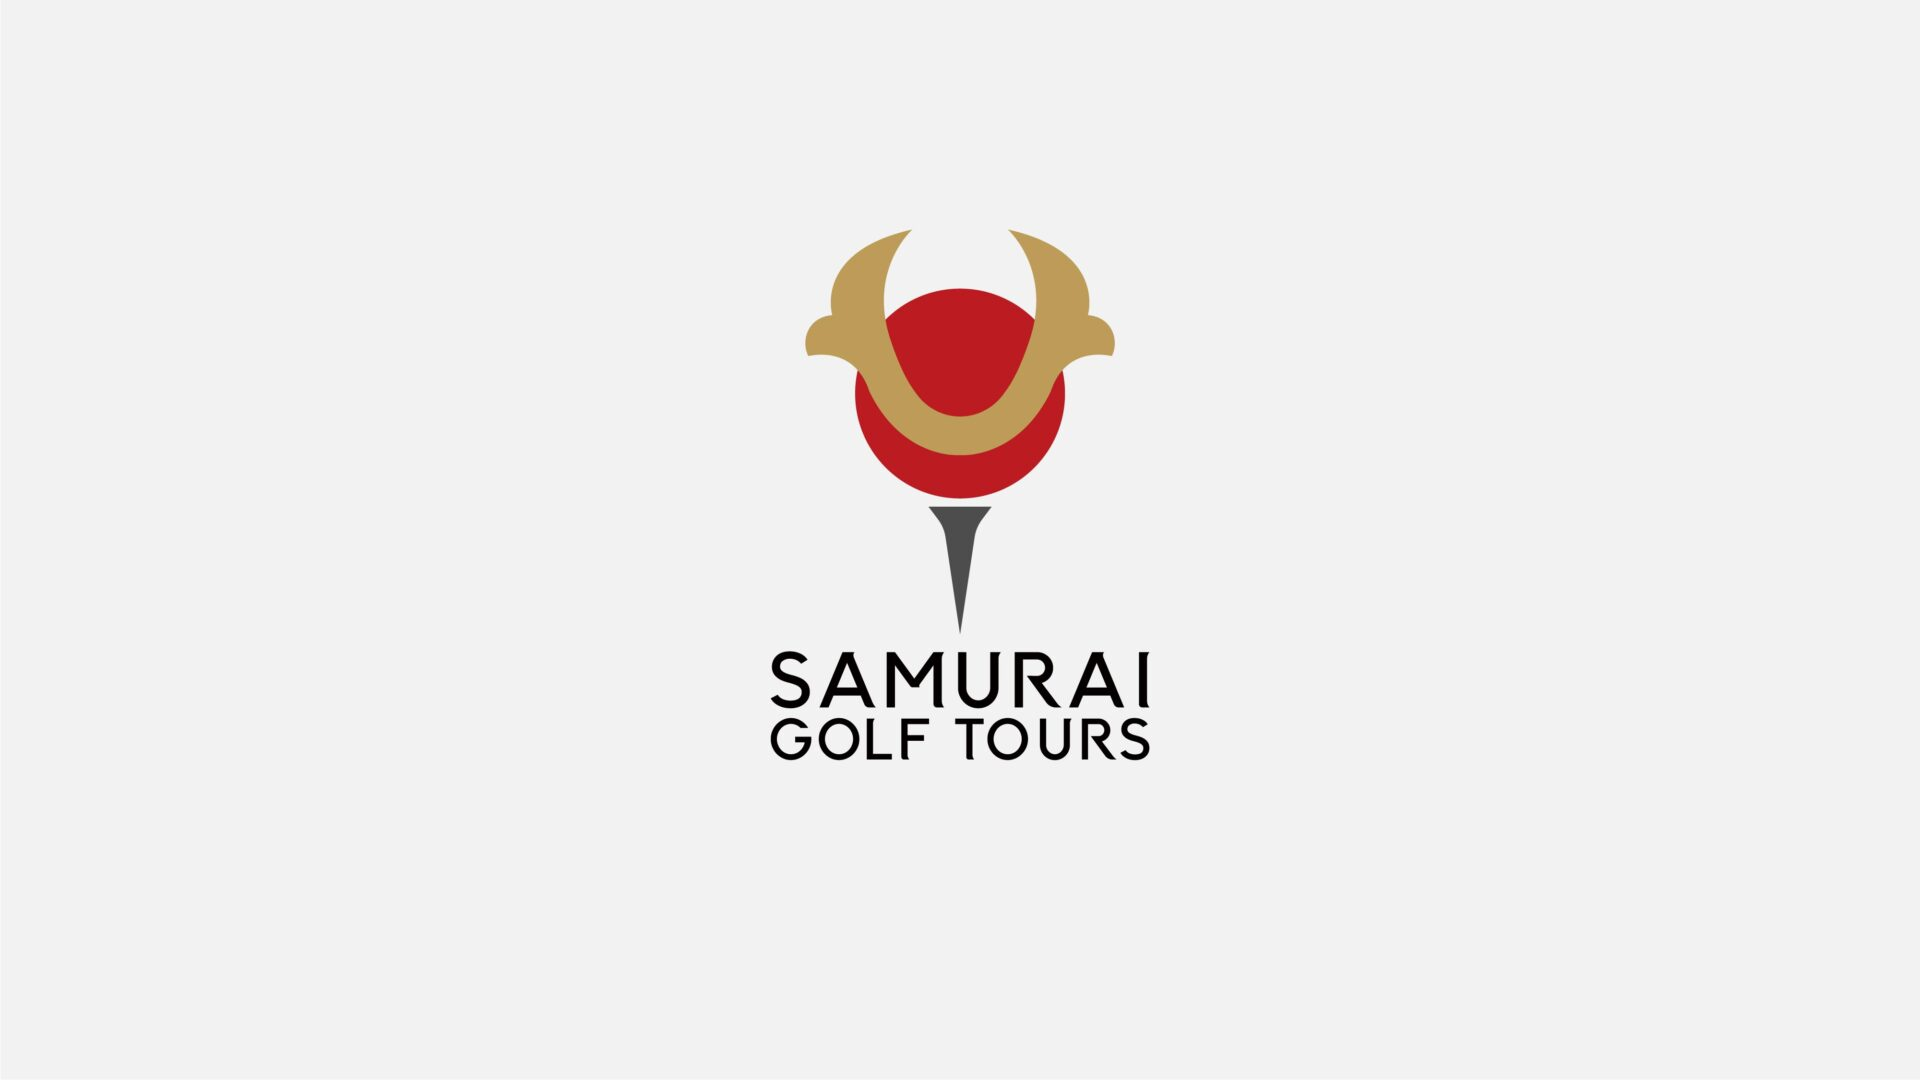 「SAMURAI GOLF TOURS」のサムネイル画像